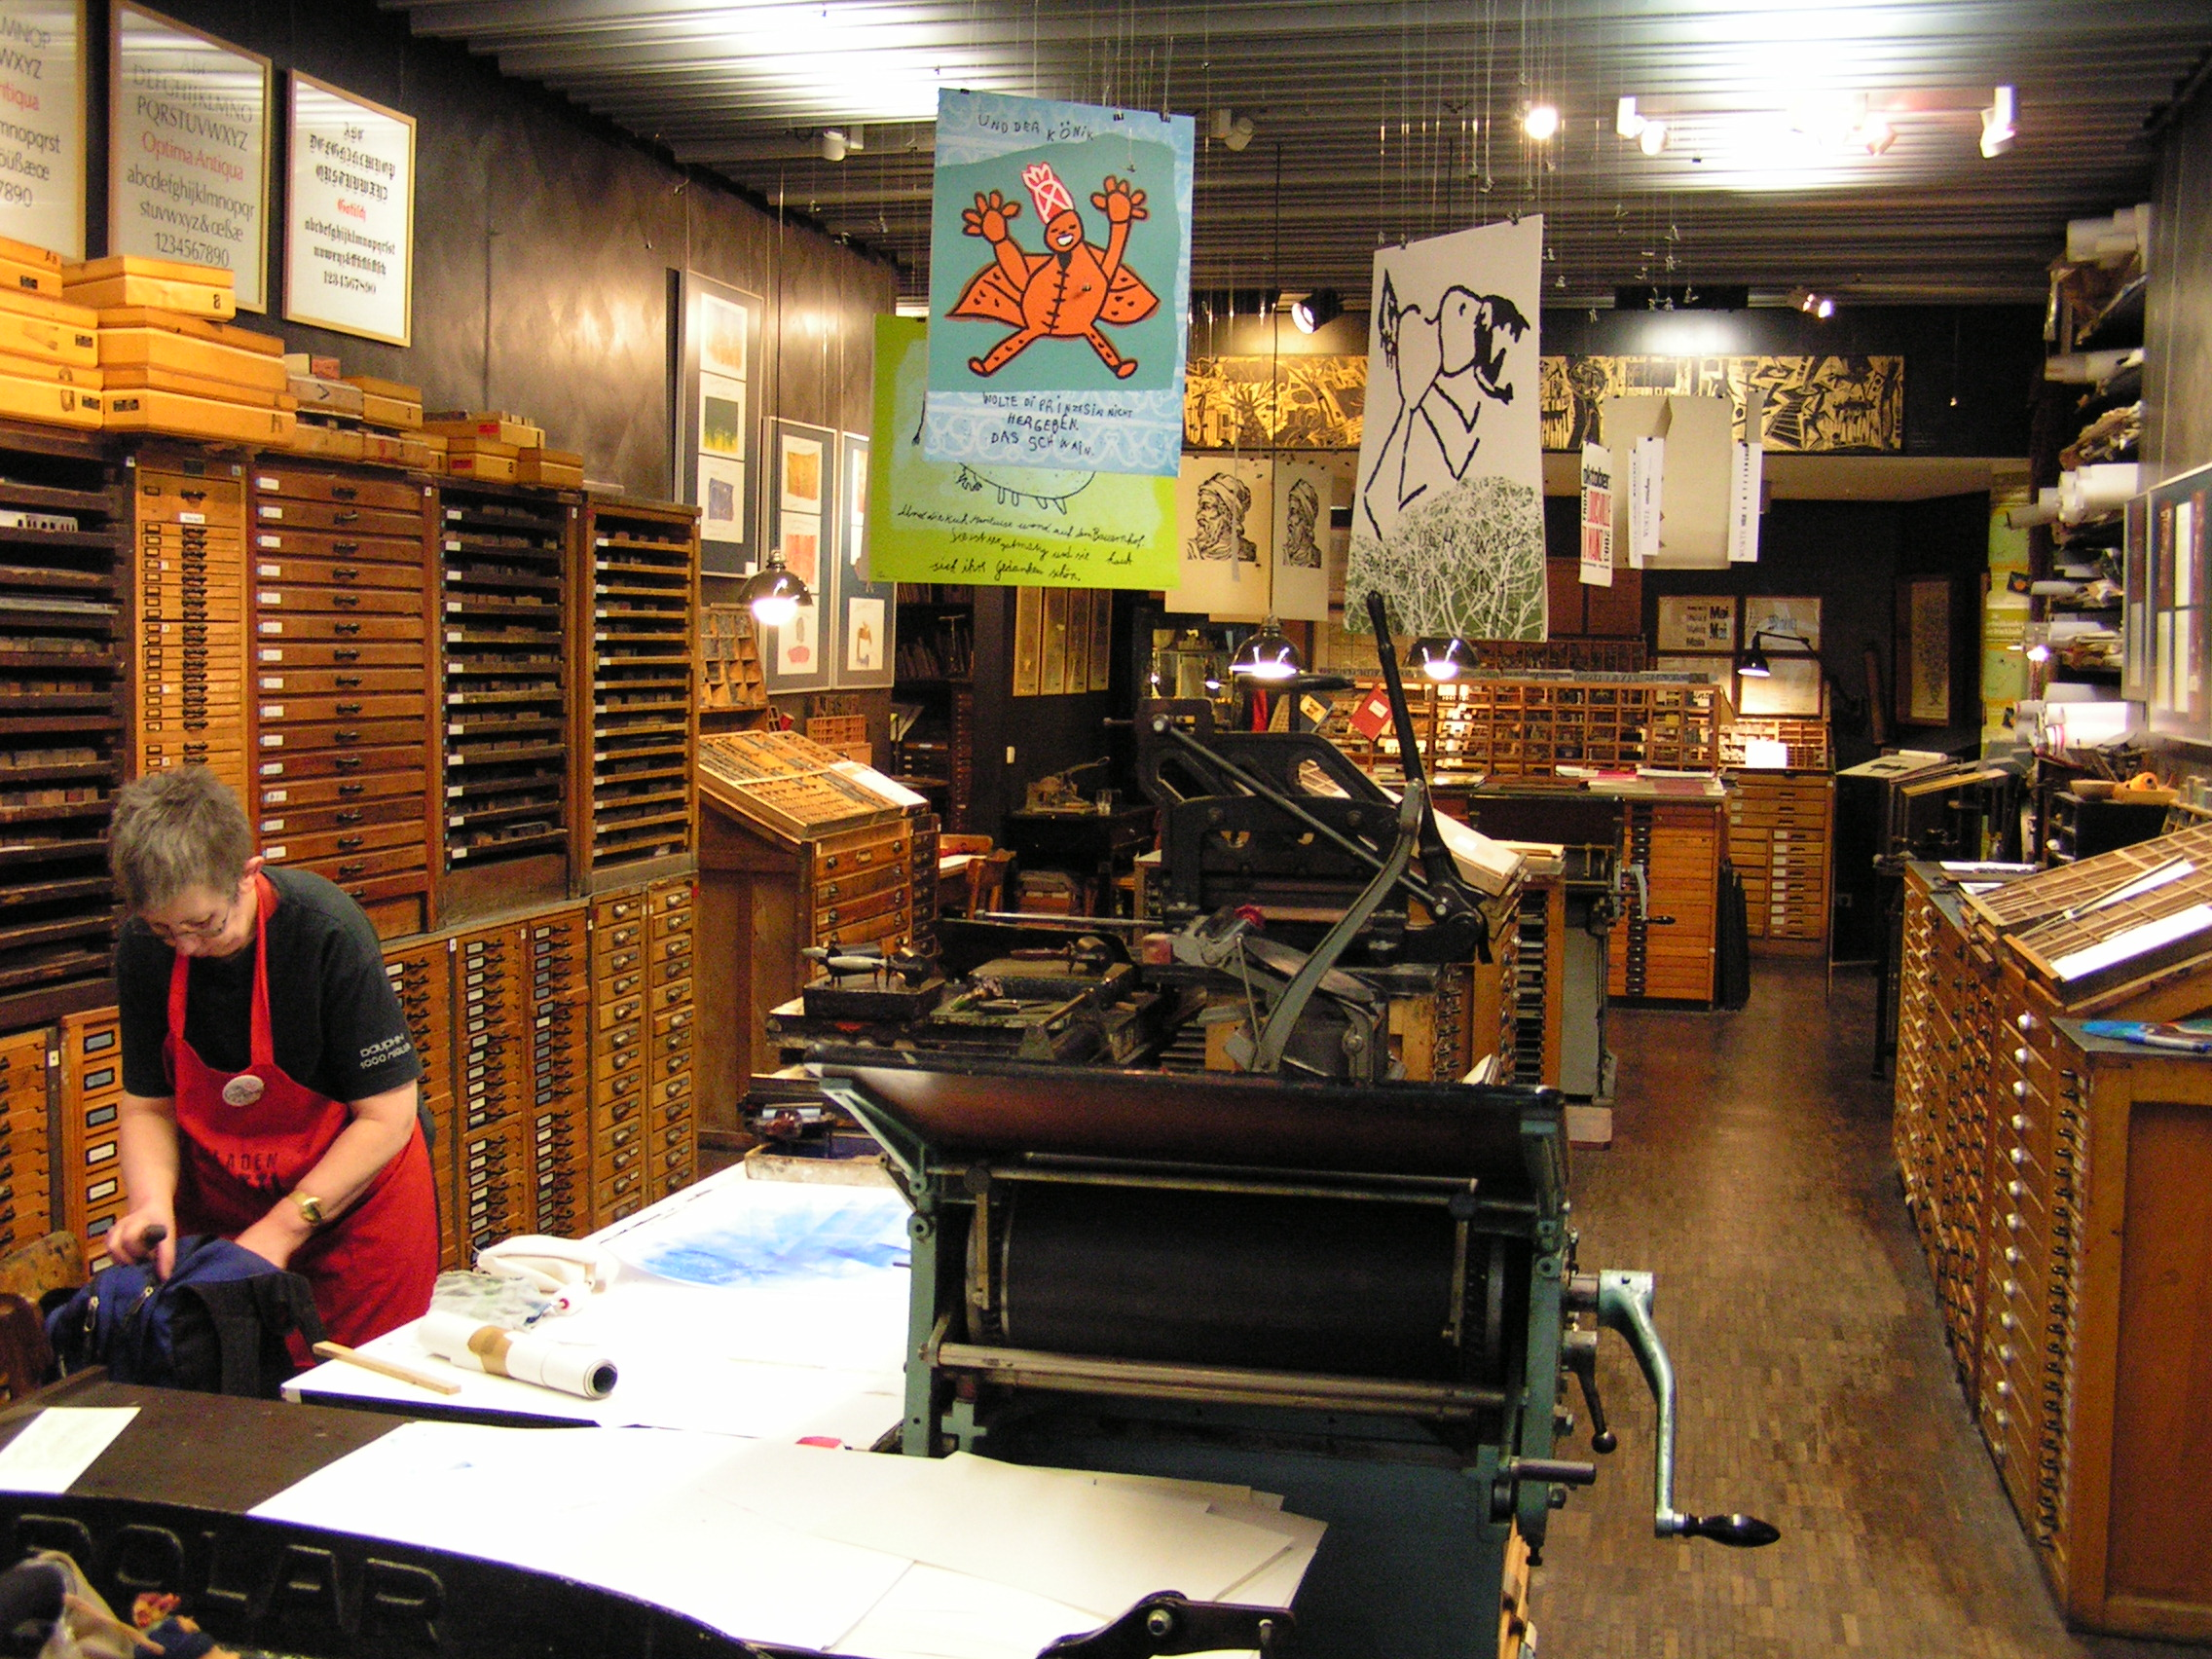 Druckladen Gutenberg Museum